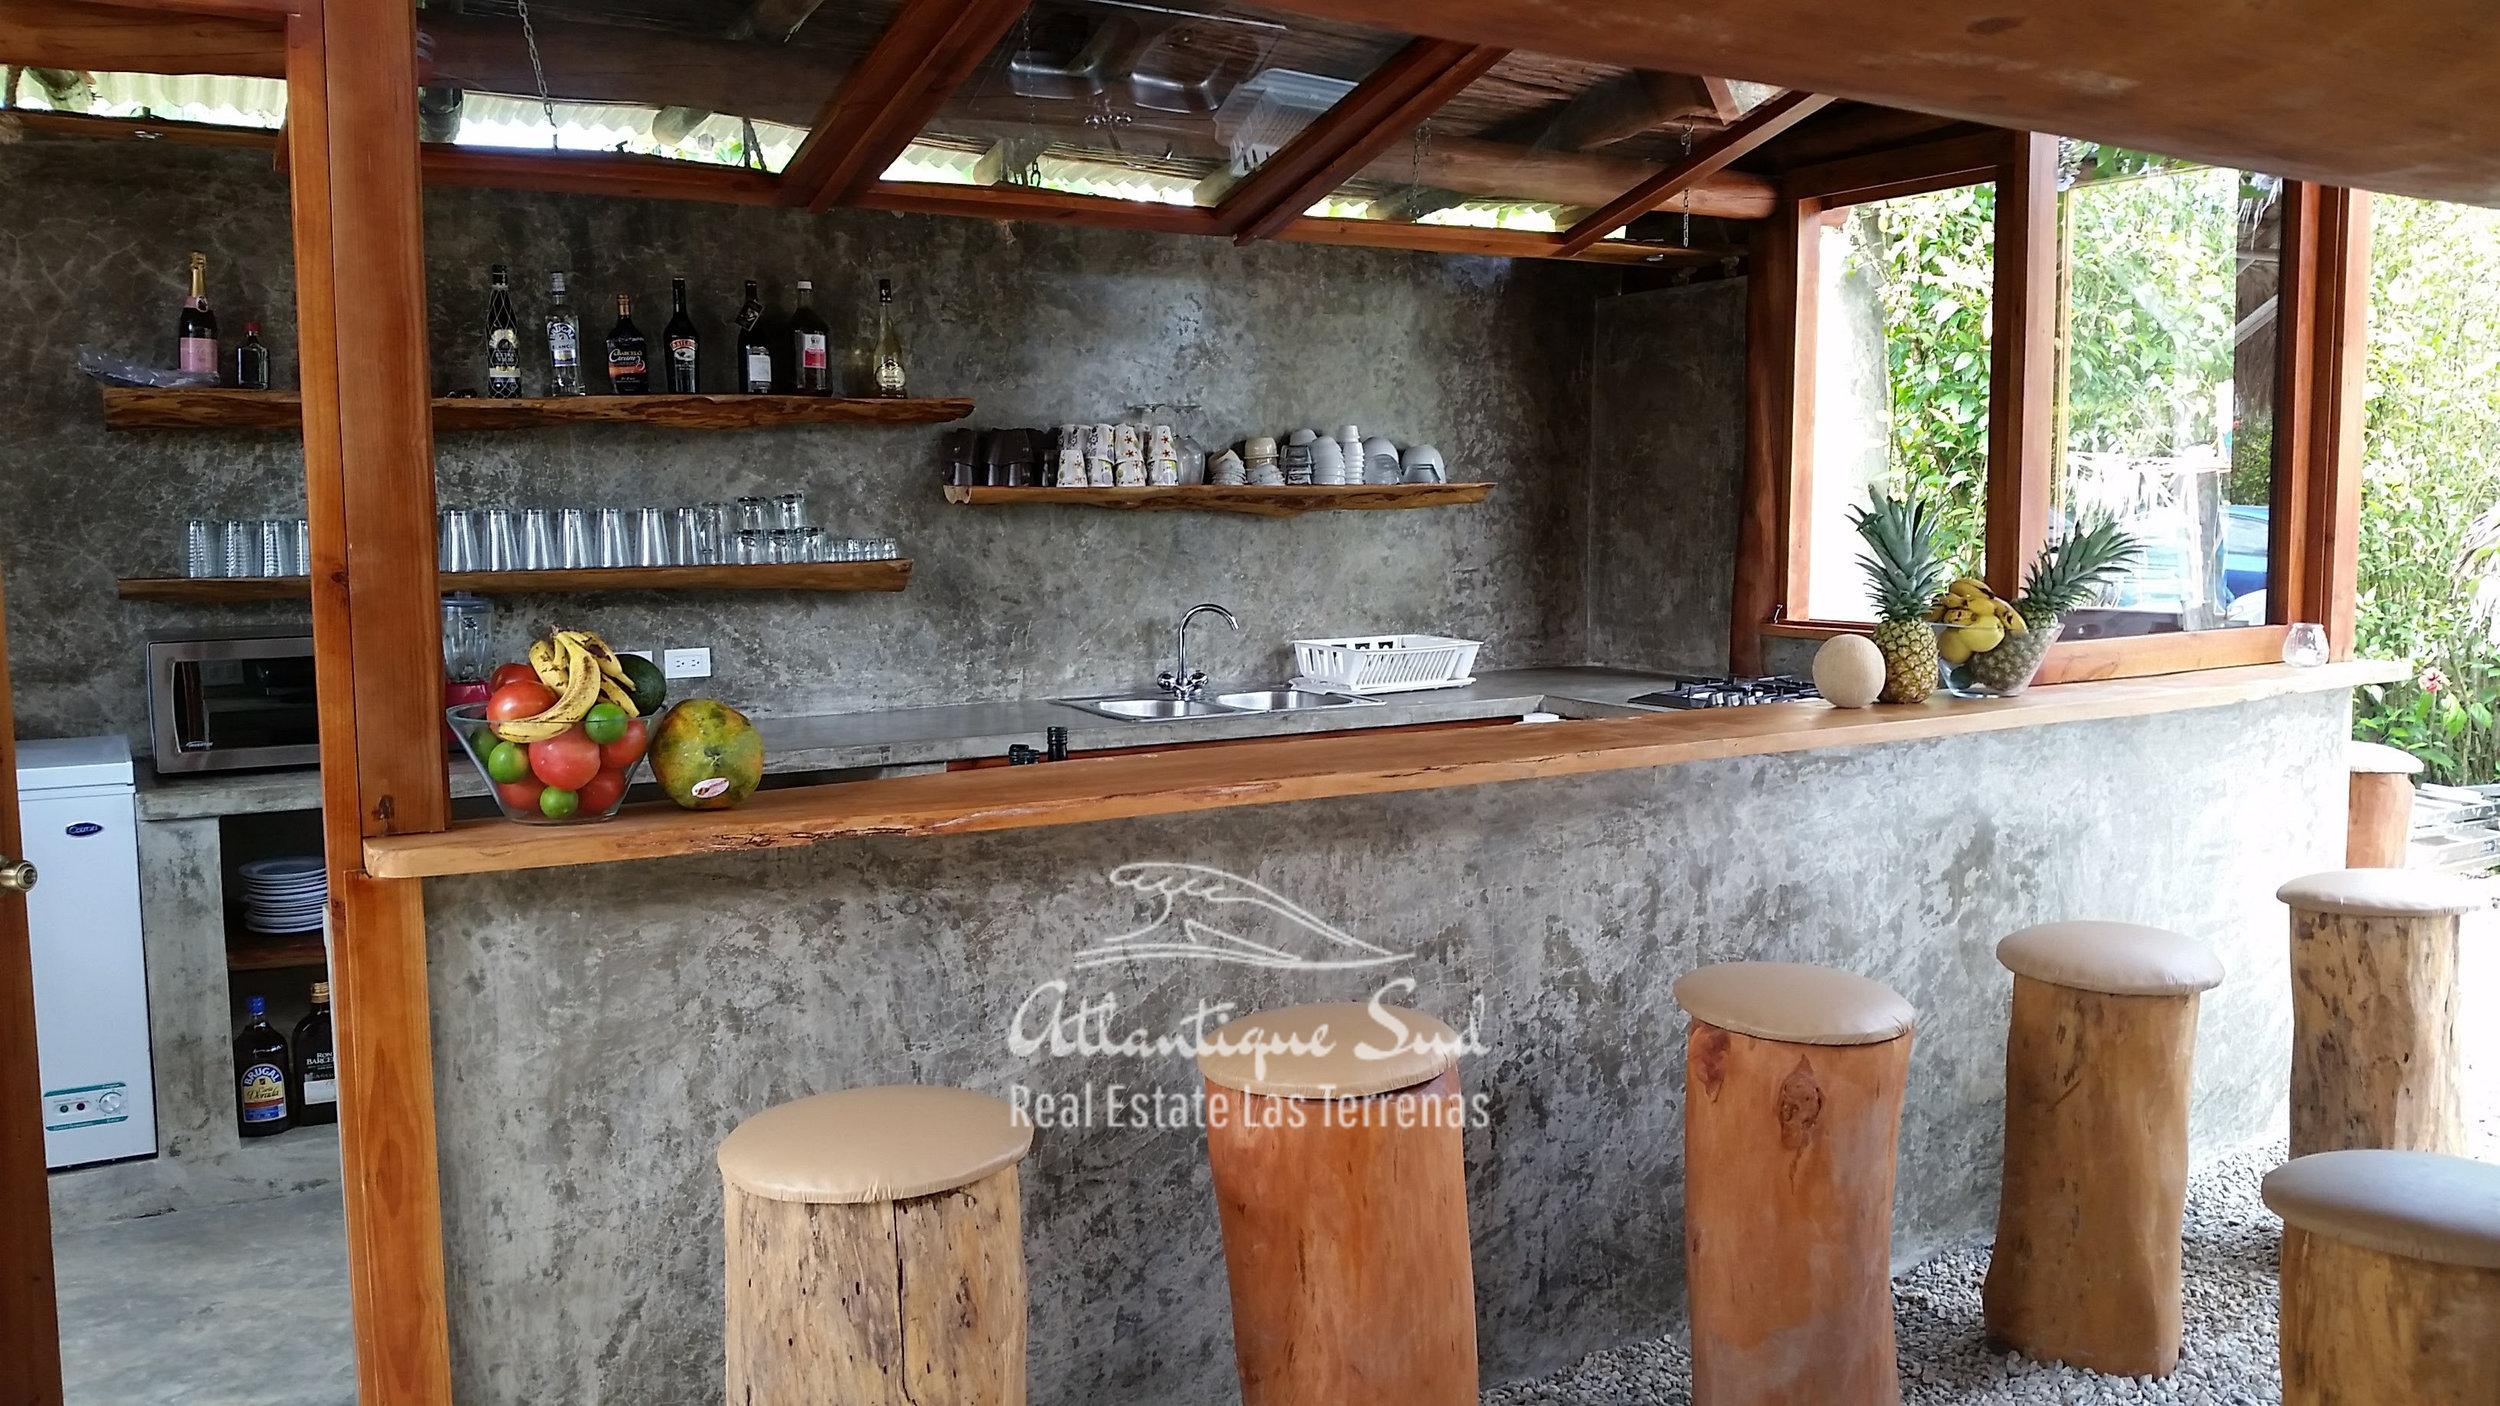 Typical caribbean hotel for sale Real Estate Las Terrenas Dominican Republic Atlantique Sud1.jpg